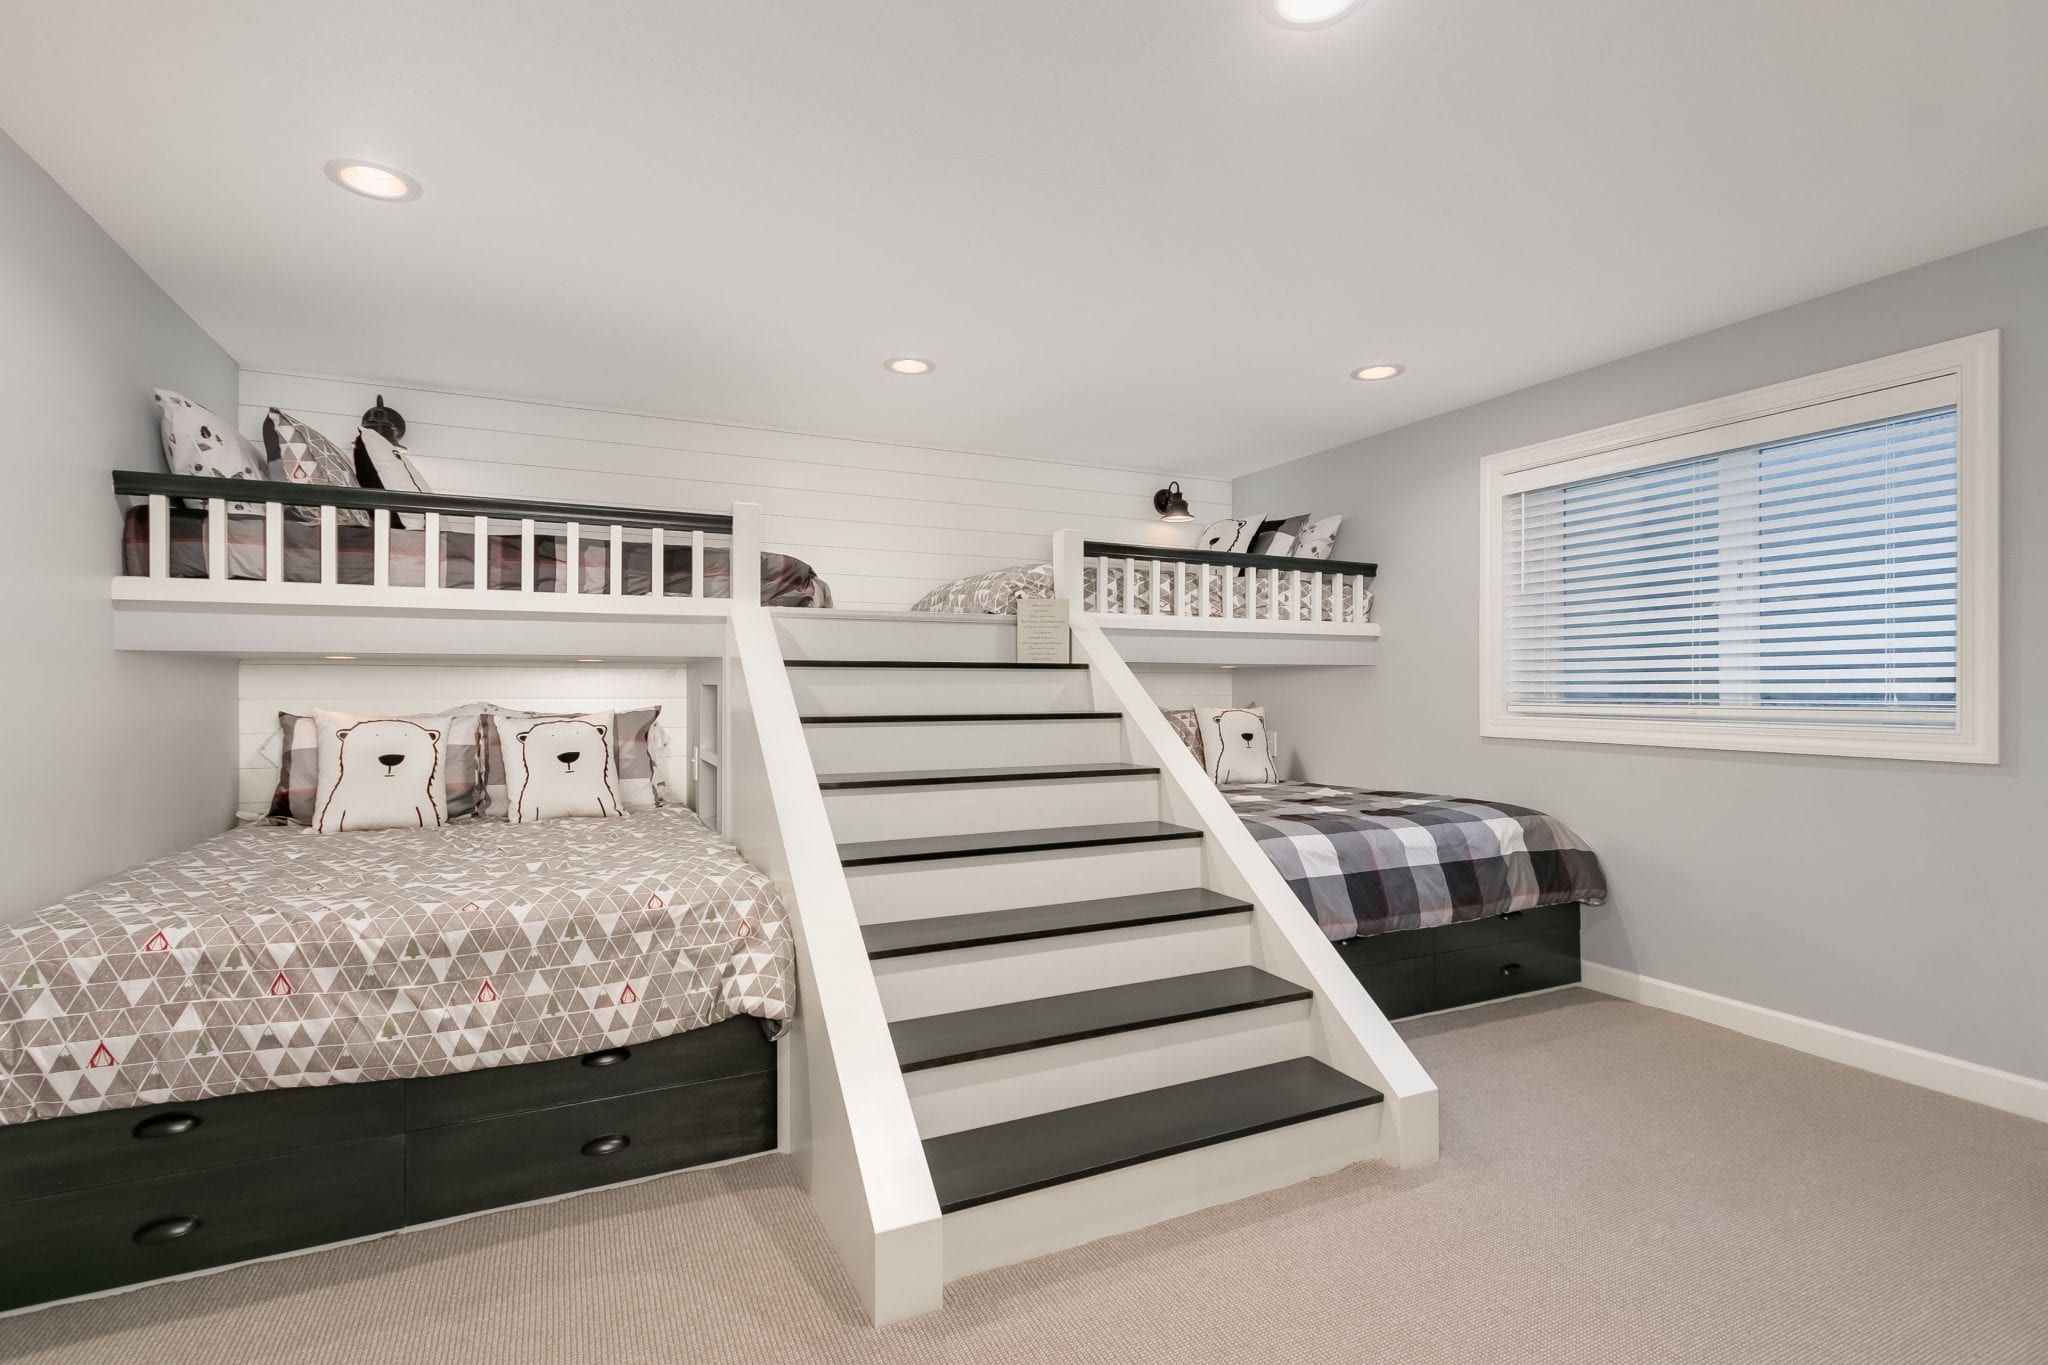 bedroom remodel | lofted bedroom design | fbc remodel